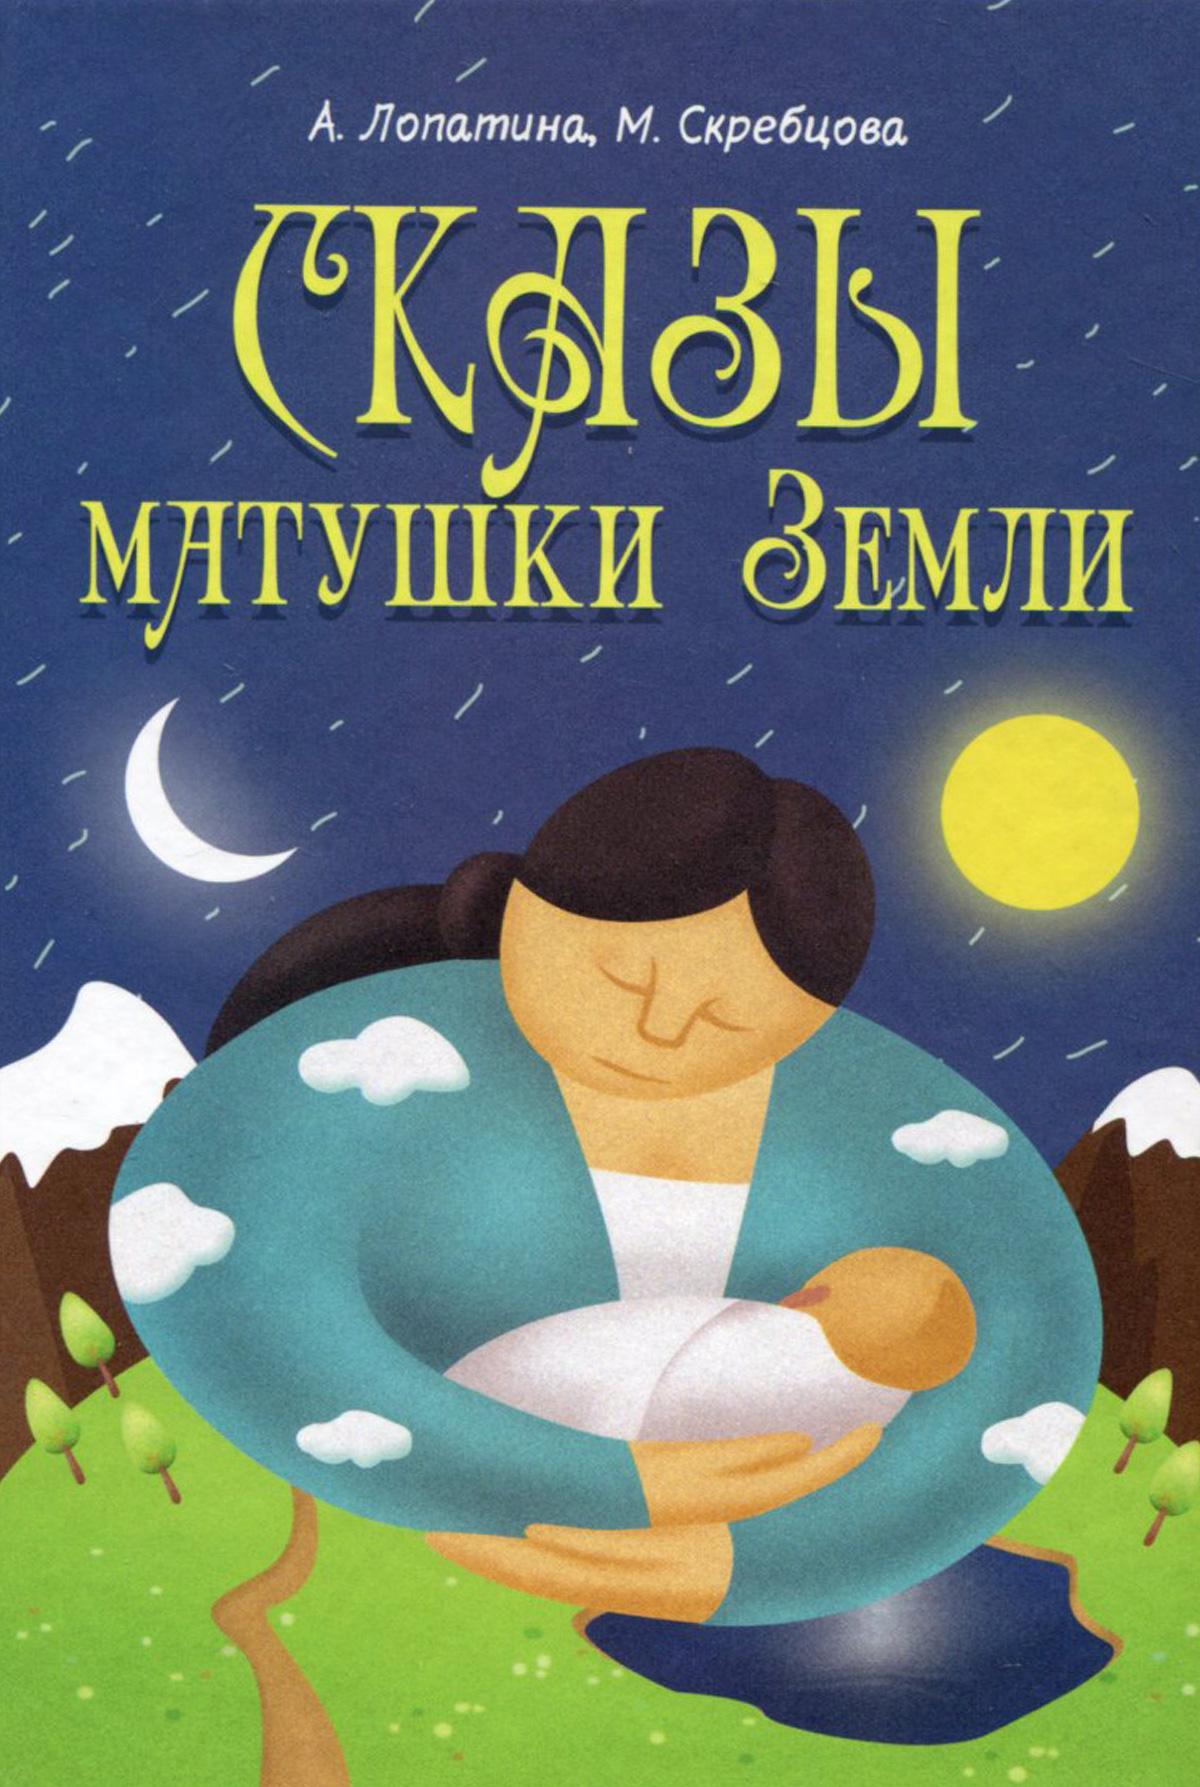 Сказы матушки Земли, А. Лопатина, М. Скребцова